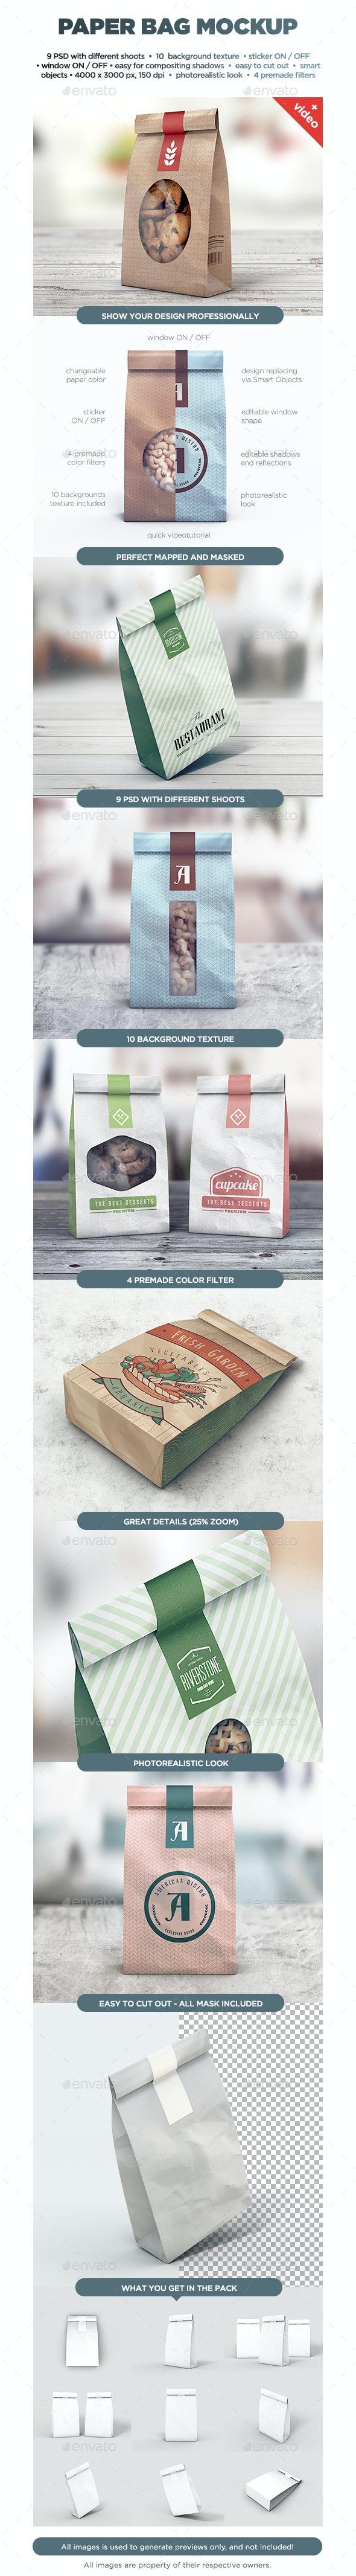 Paper Bag MockUp - Food and Drink Packaging